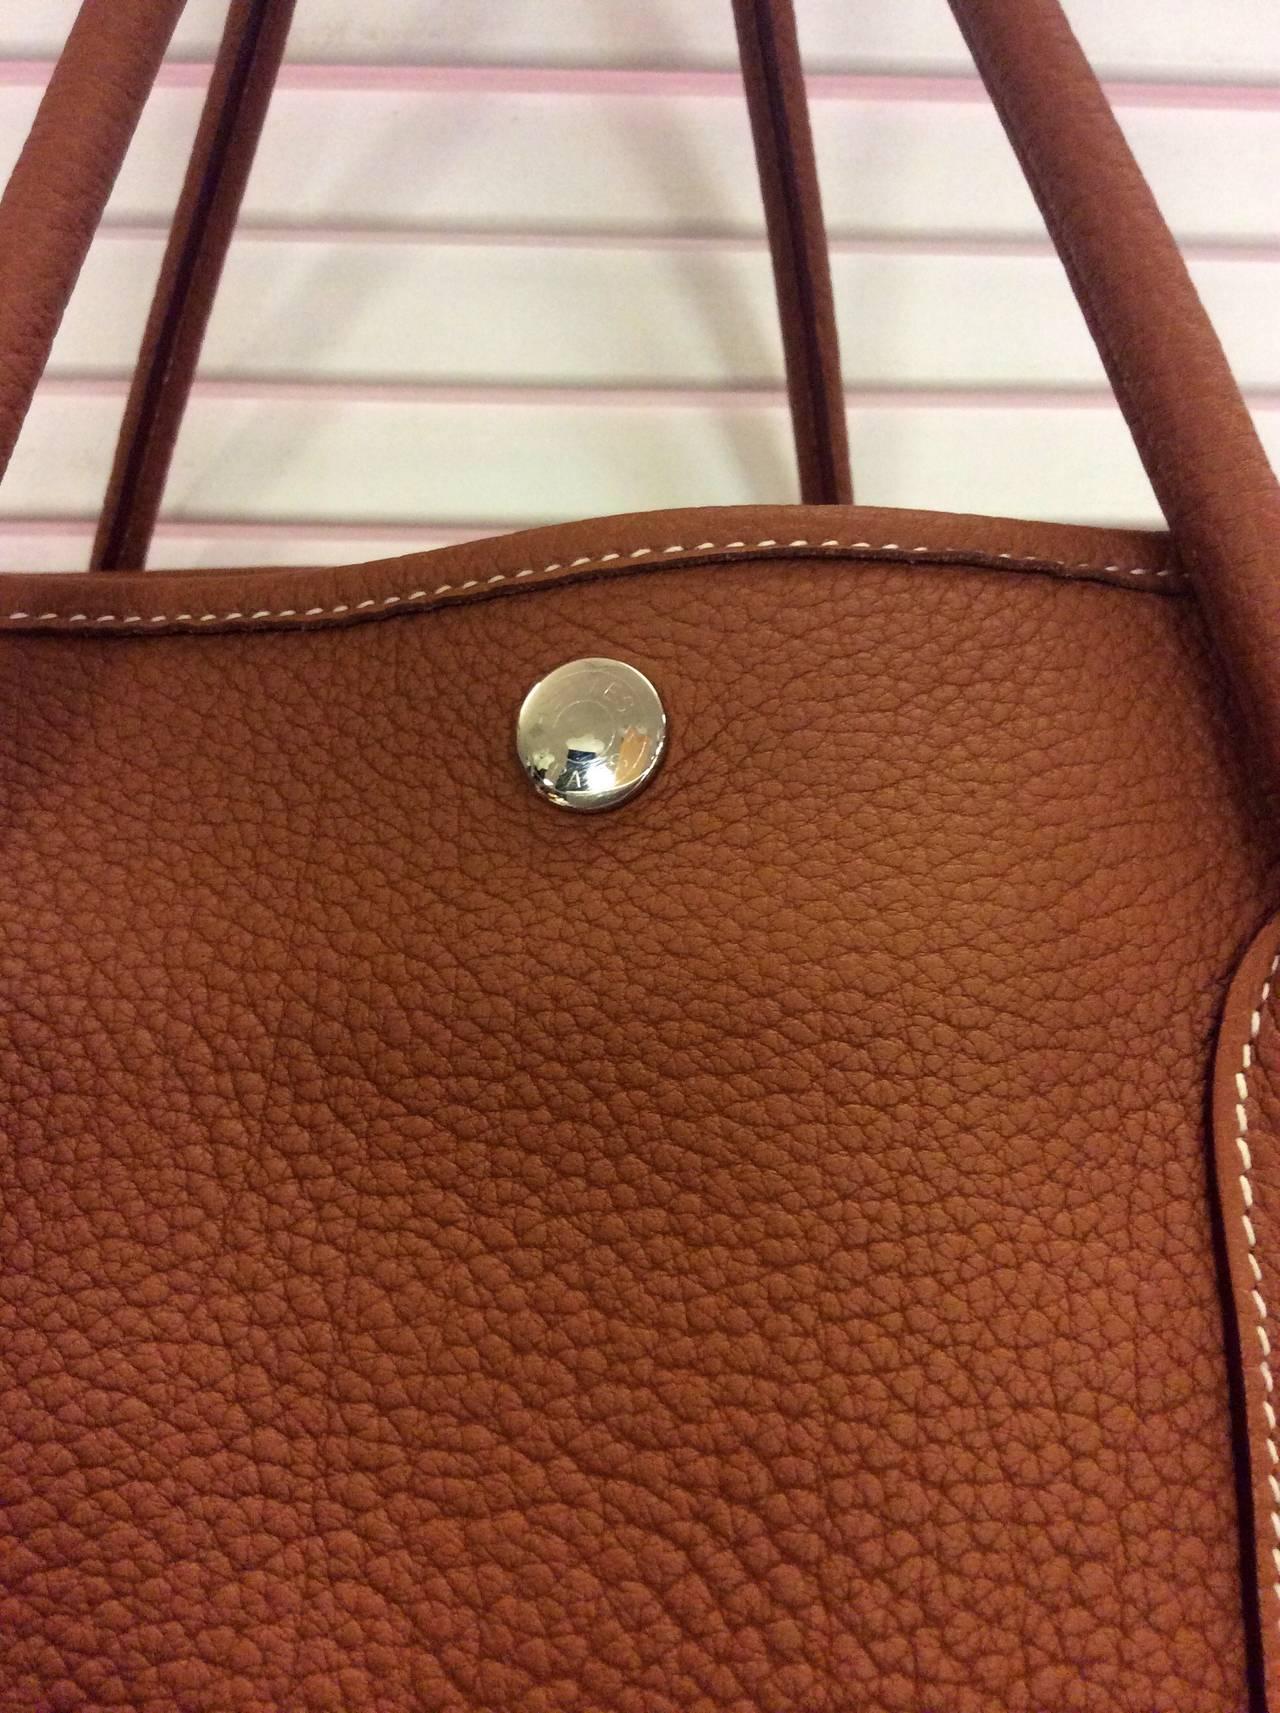 sac birkin hermes imitation - Hermes 2014 Garden Party MM 36cm Negonda Gold Leather Tote at 1stdibs